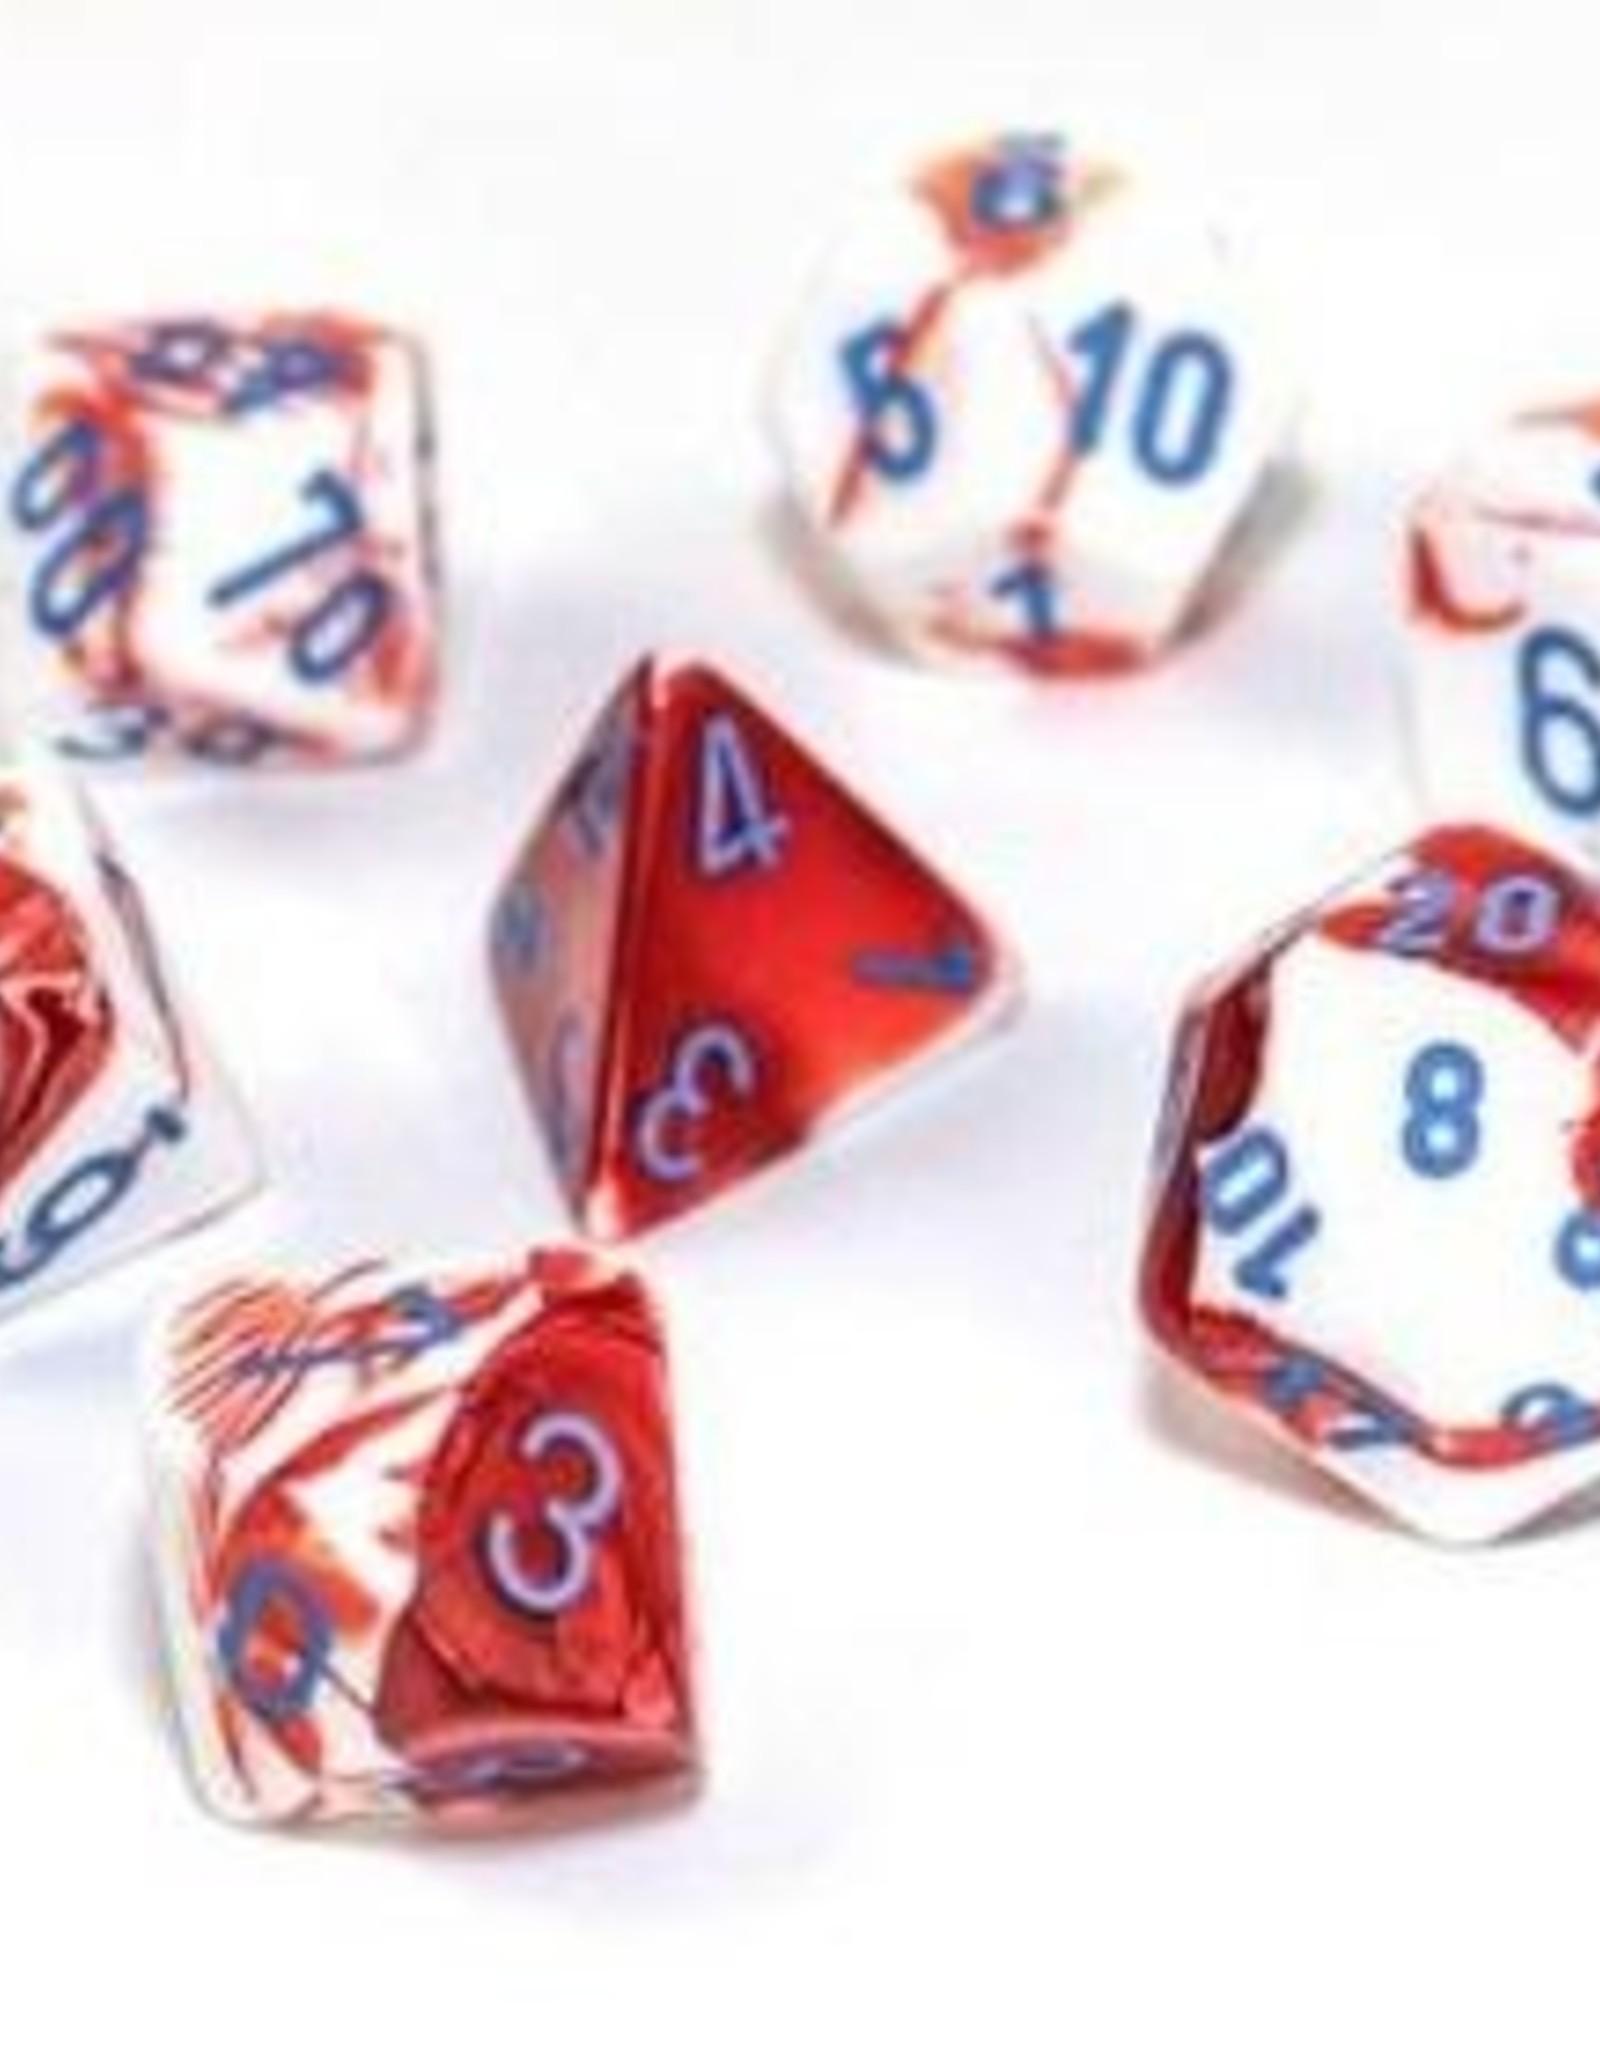 Chessex Chessex 7-Die set Lab Dice Gemini Red White/Blue